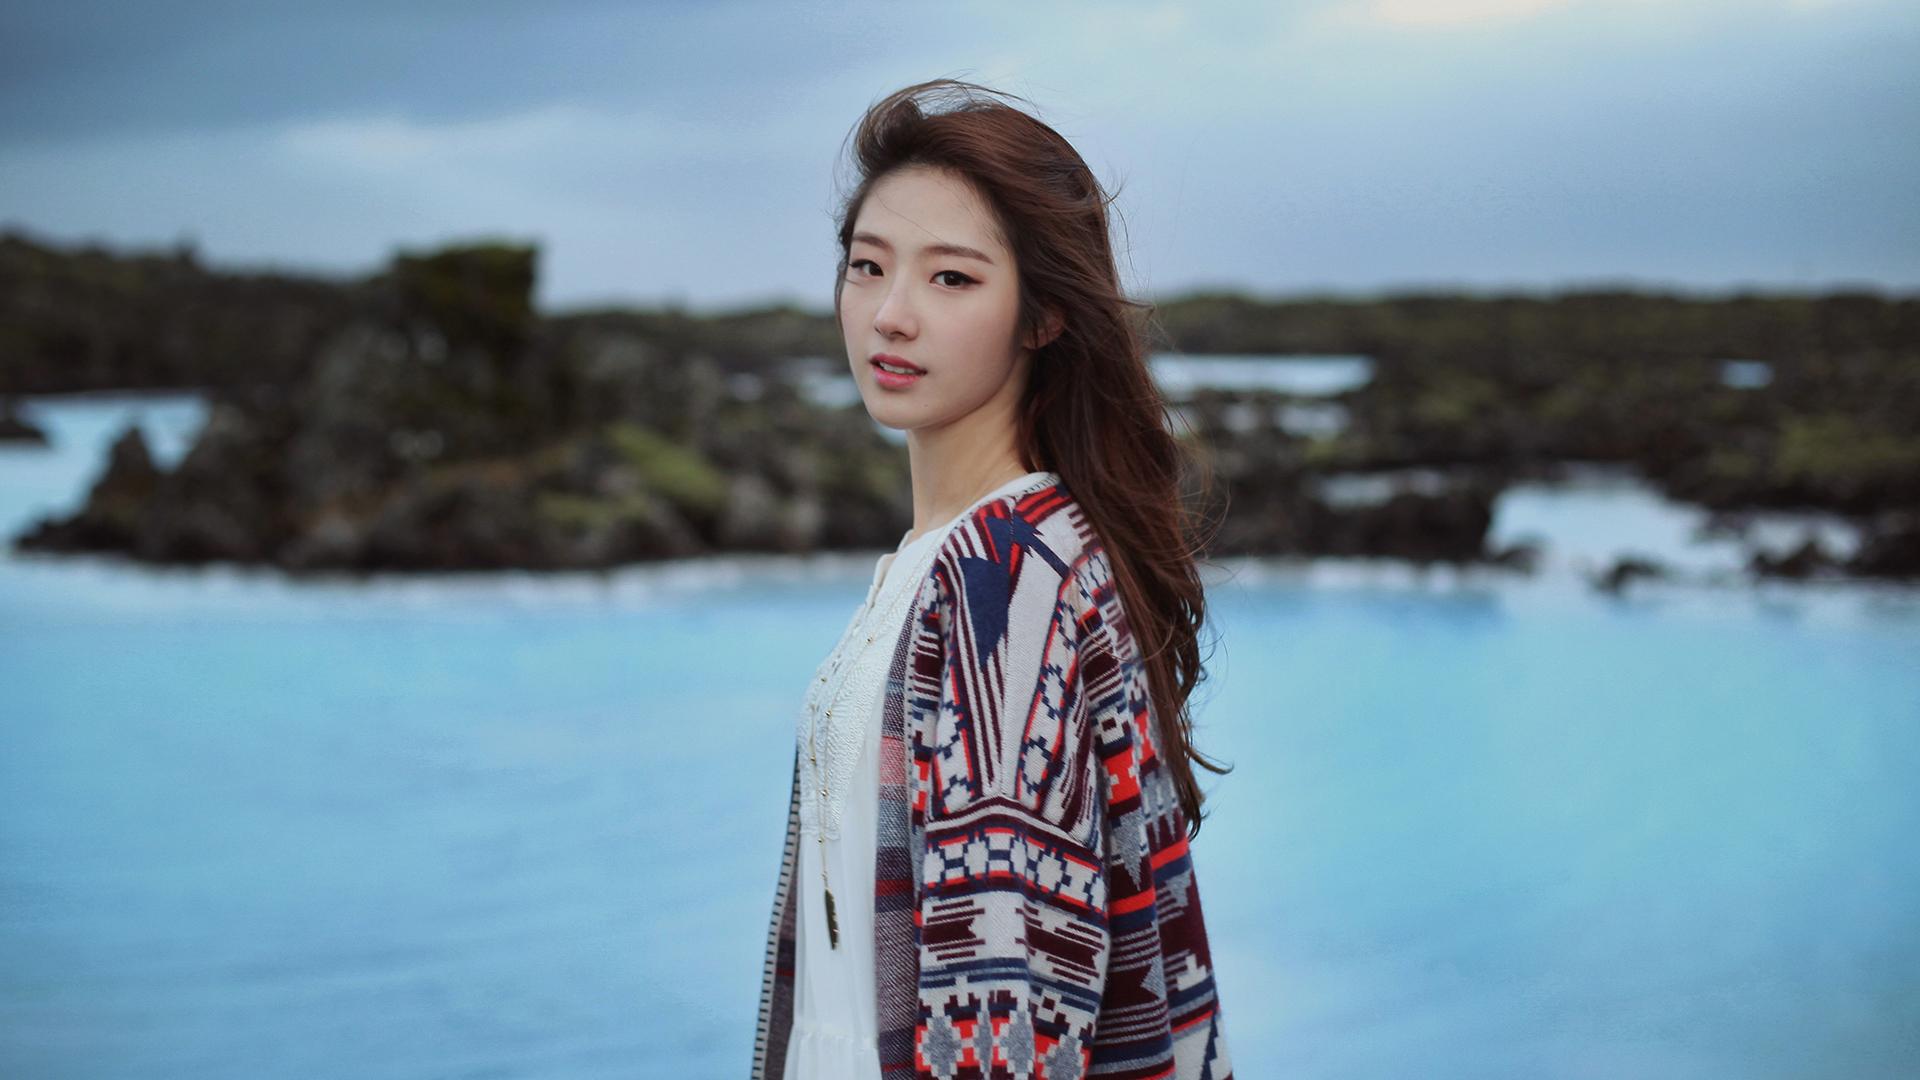 Вагина фото корейские девушки фото анал порно фото